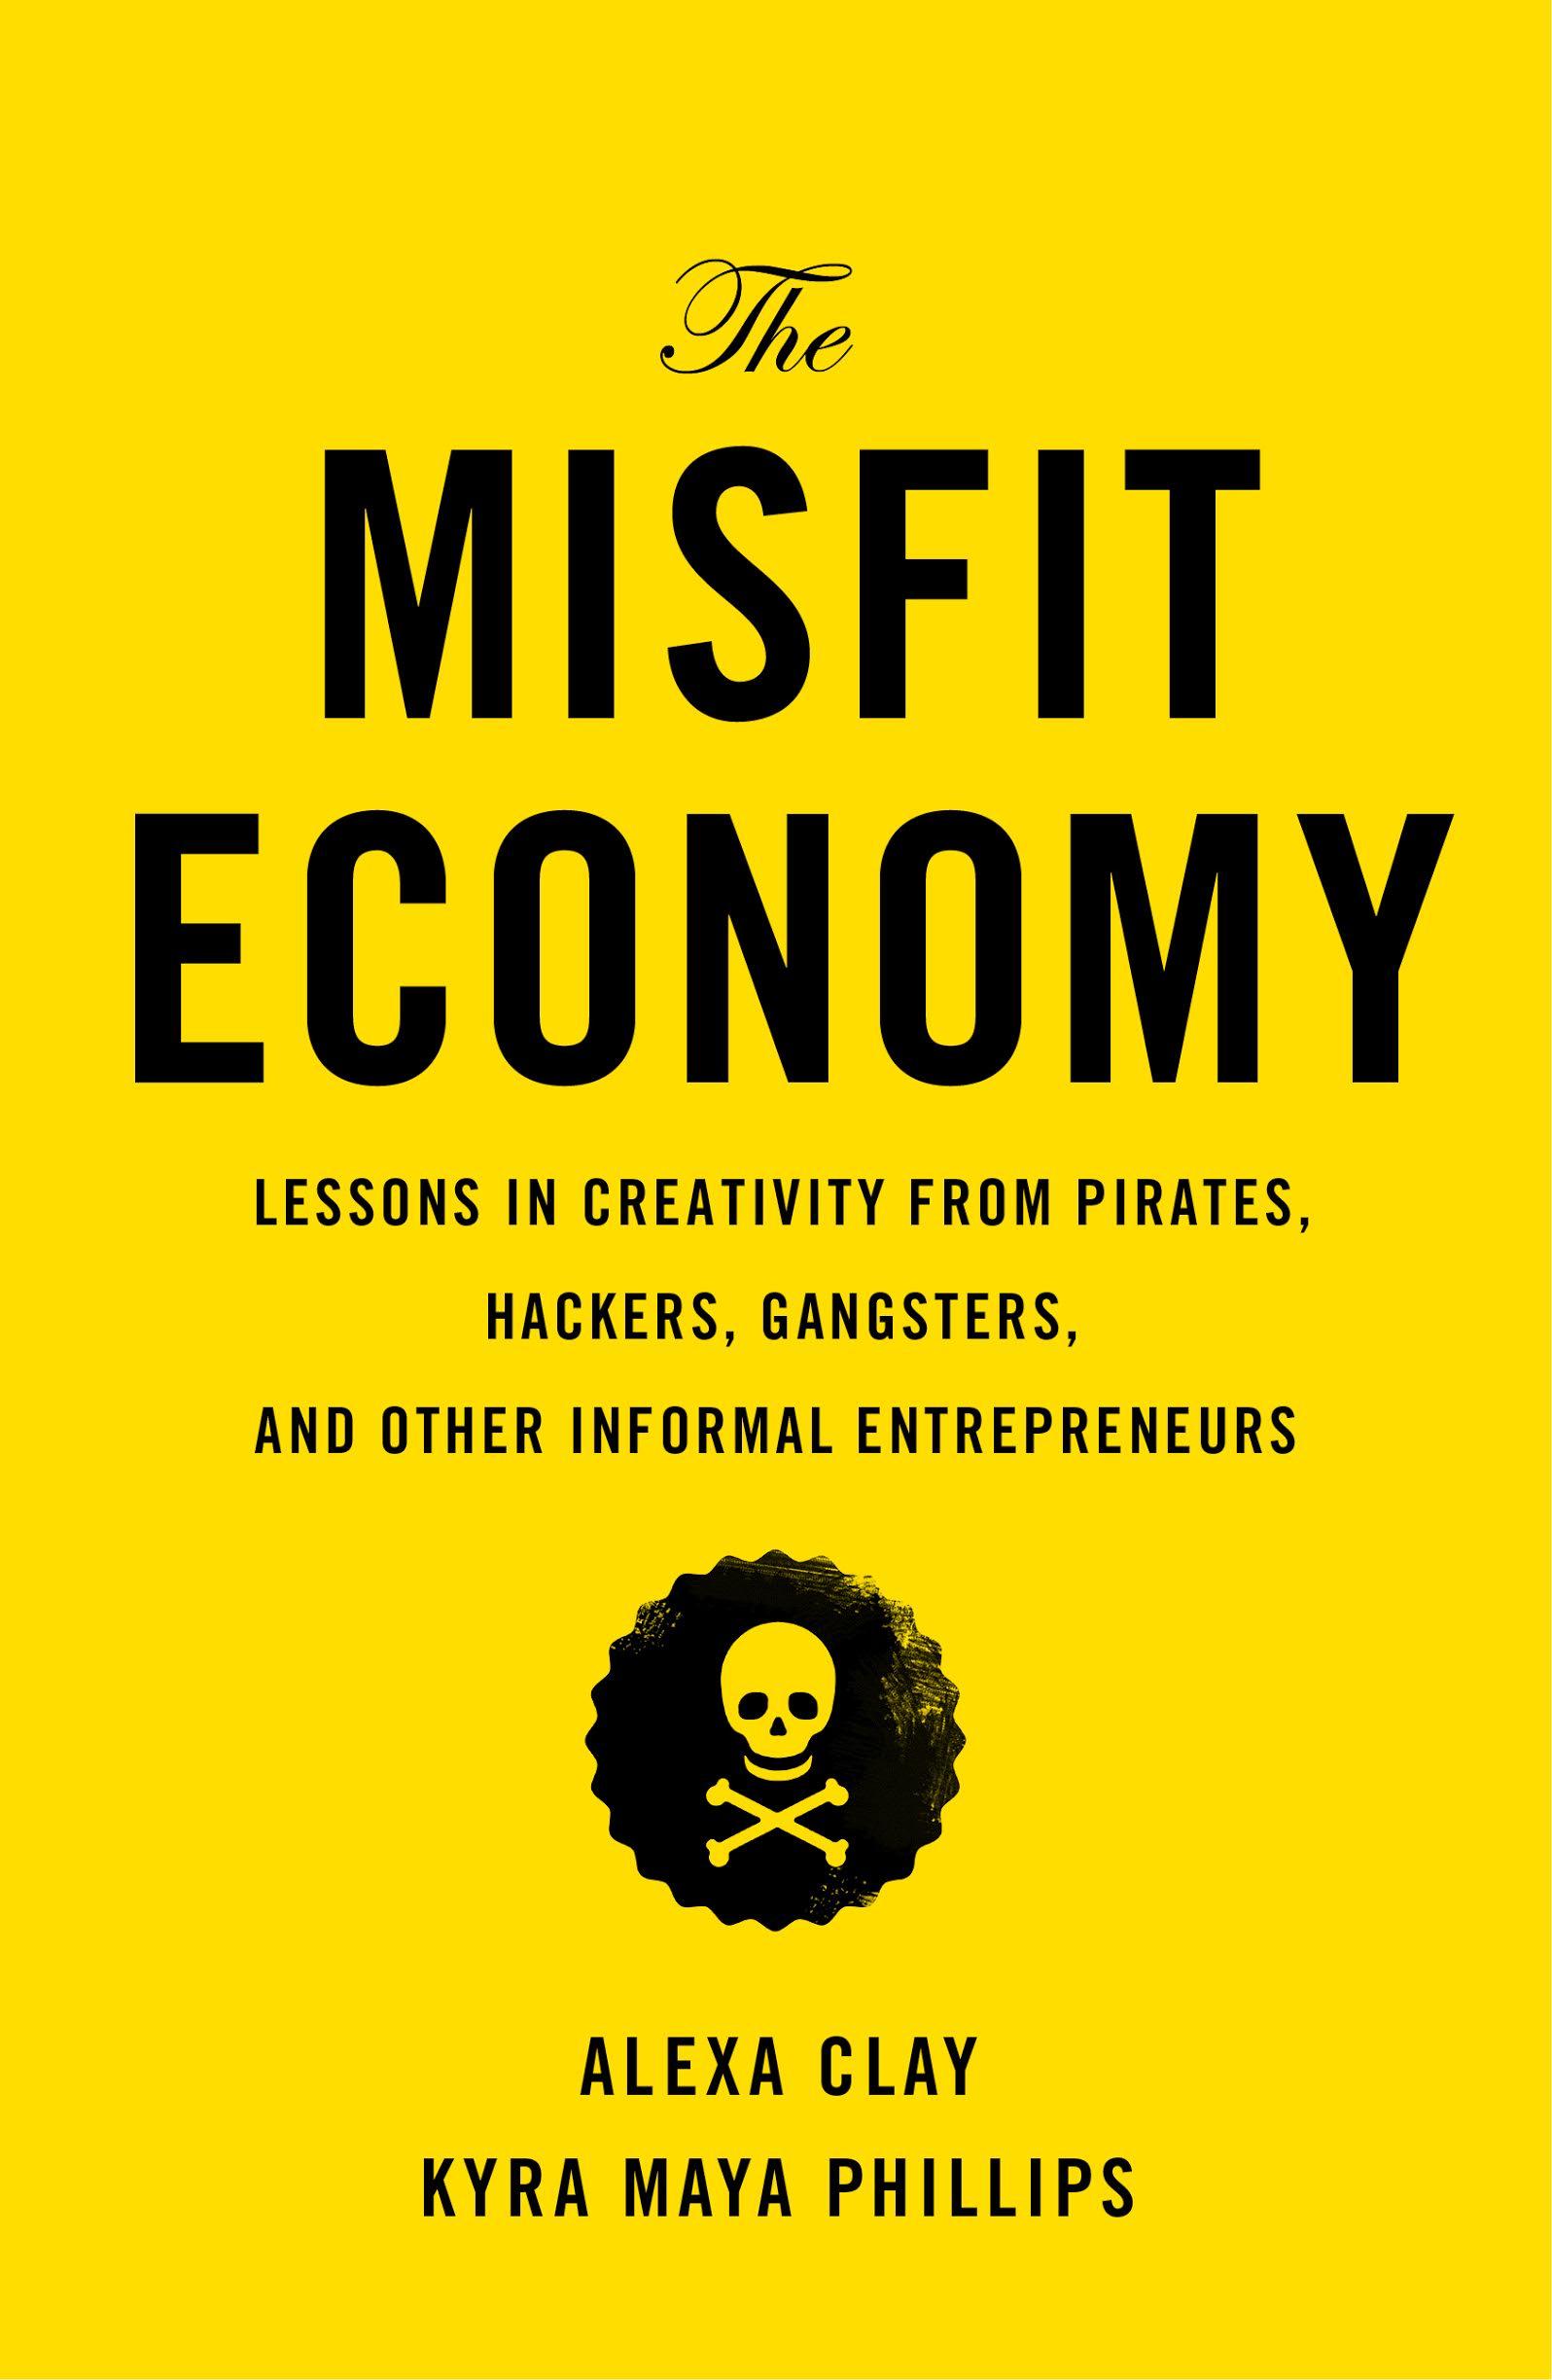 misfit_economy_flat.jpg